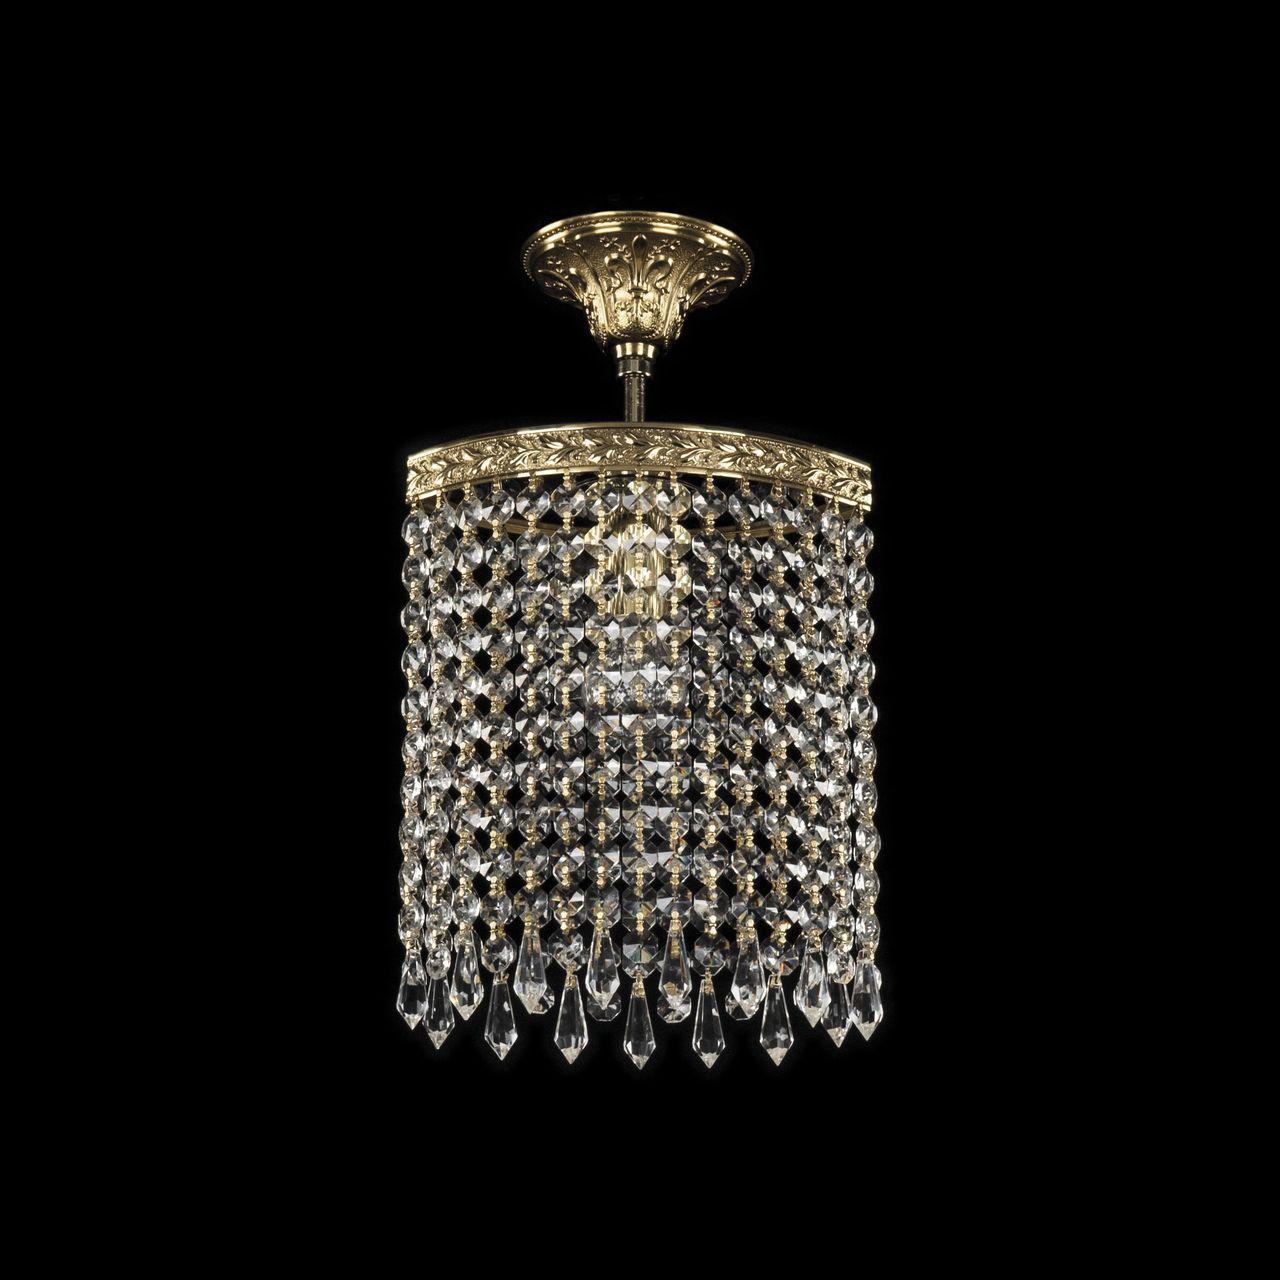 Подвесной светильник Bohemia Ivele 19203/20IV G Drops